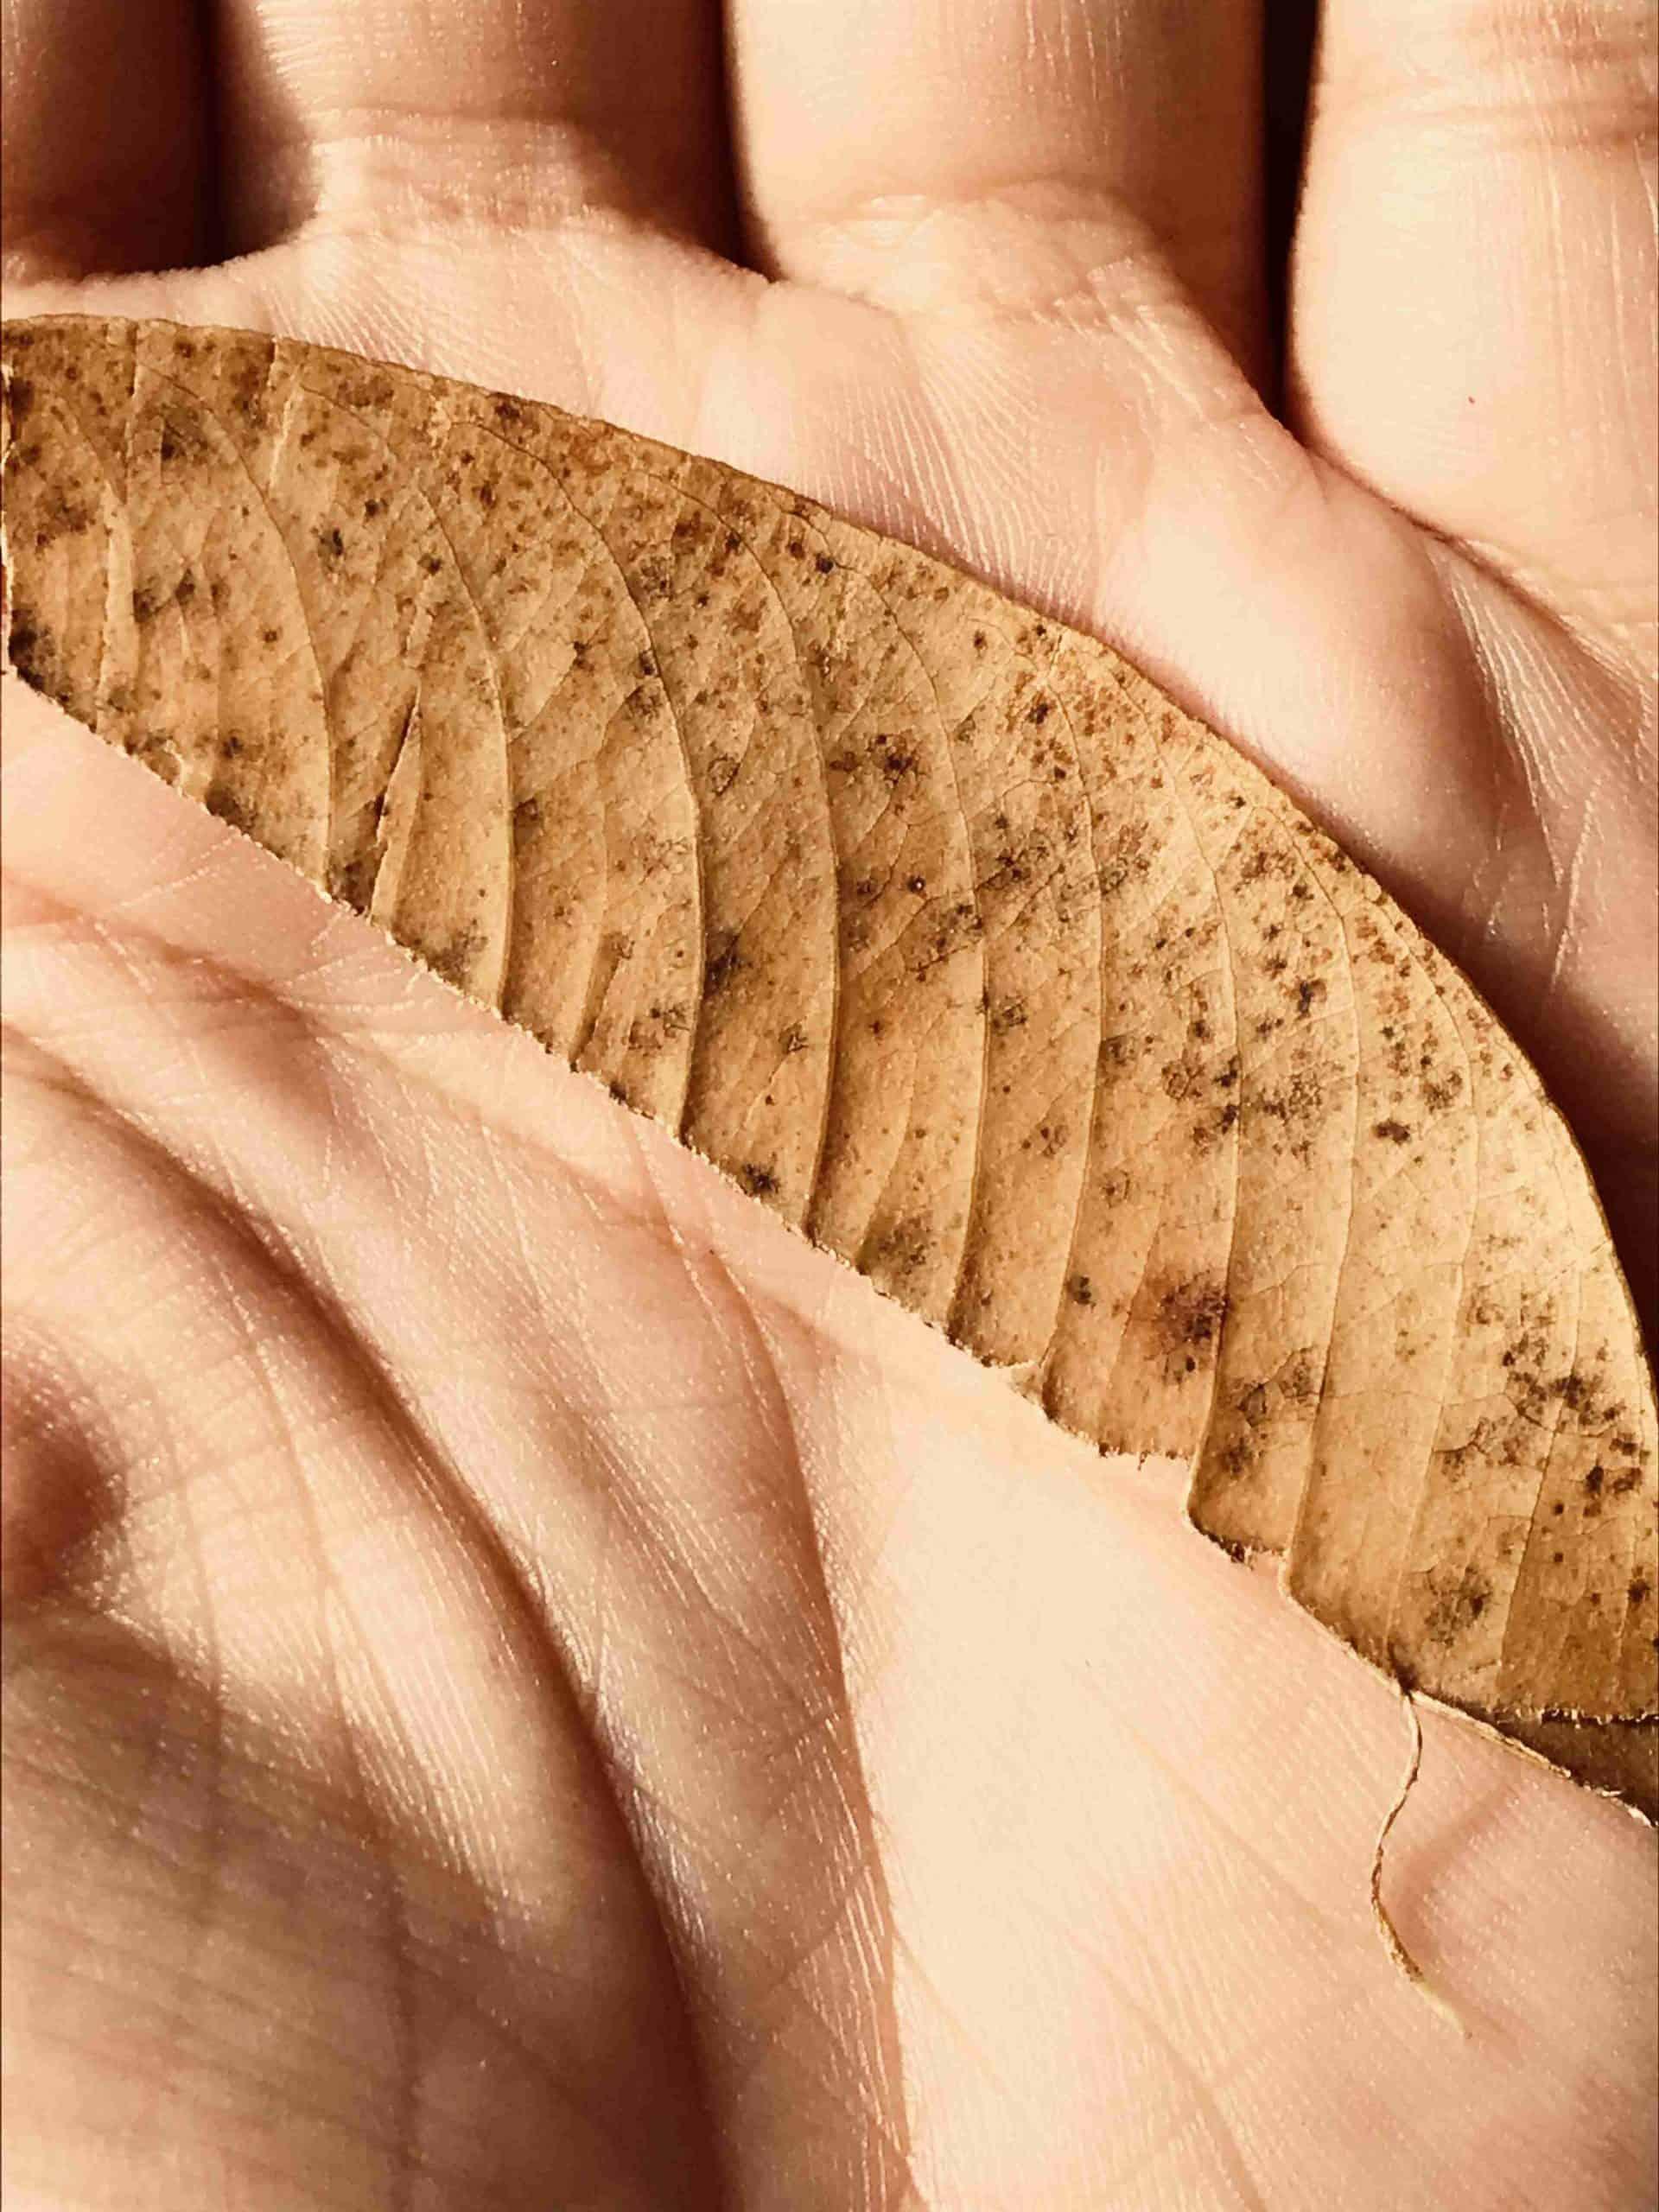 Dry Hands Dry Skin